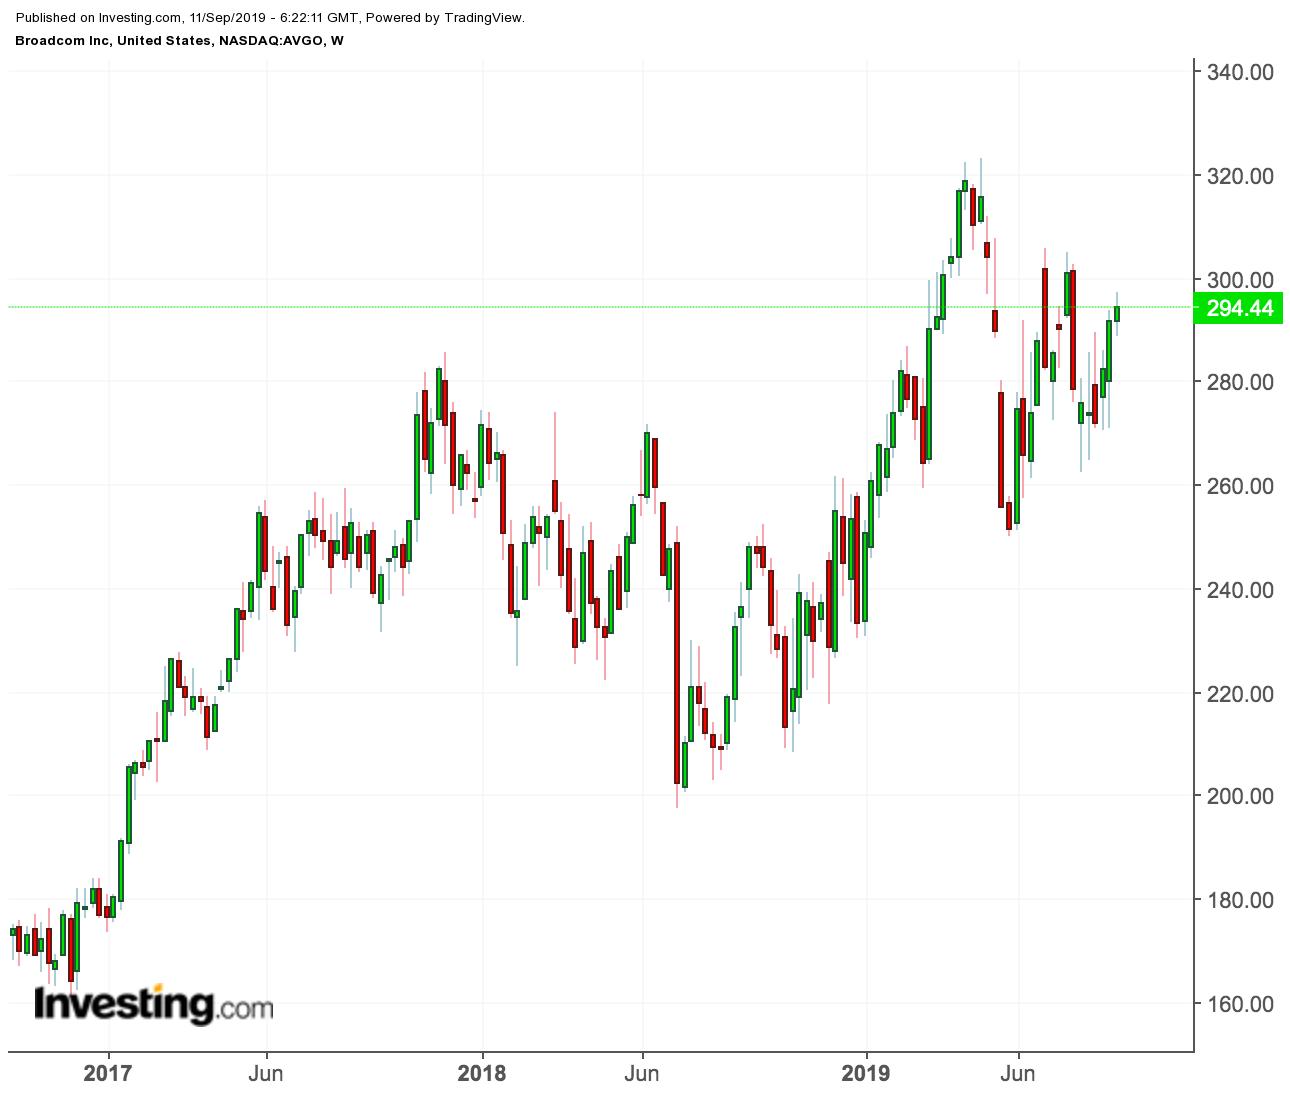 Broadcom price chart